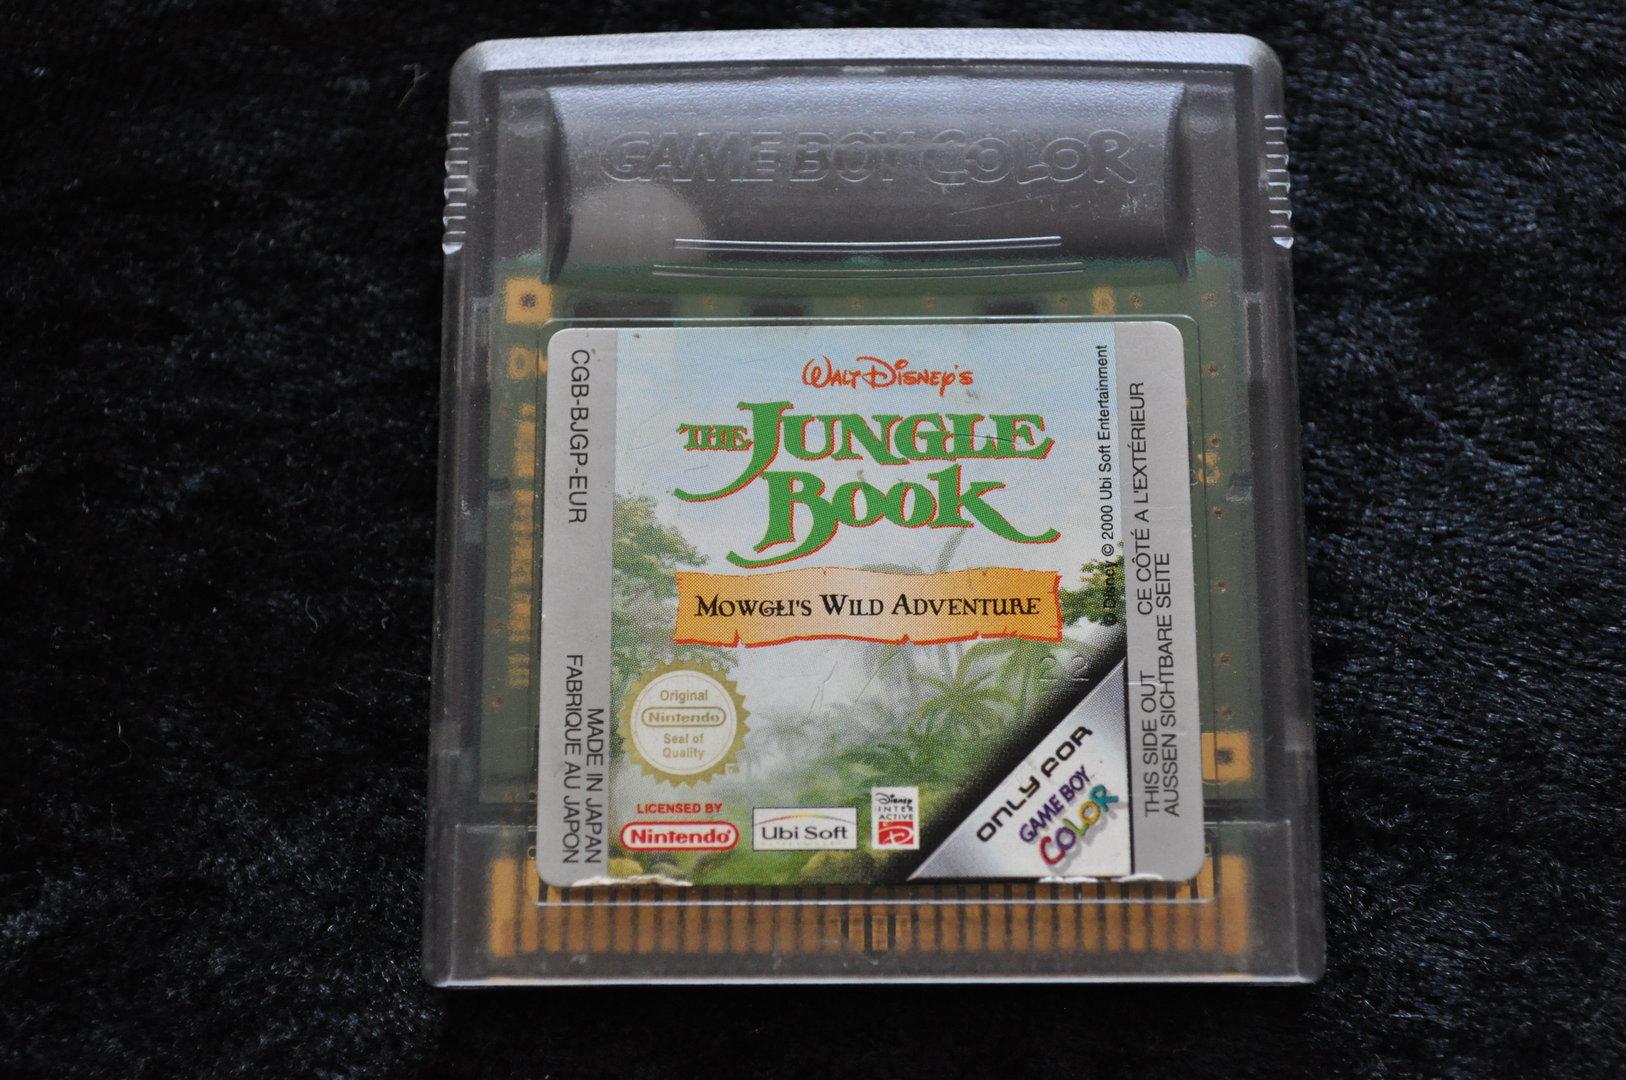 Gameboy color jungle book - Walt Disneys Jungle Book Gameboy Color